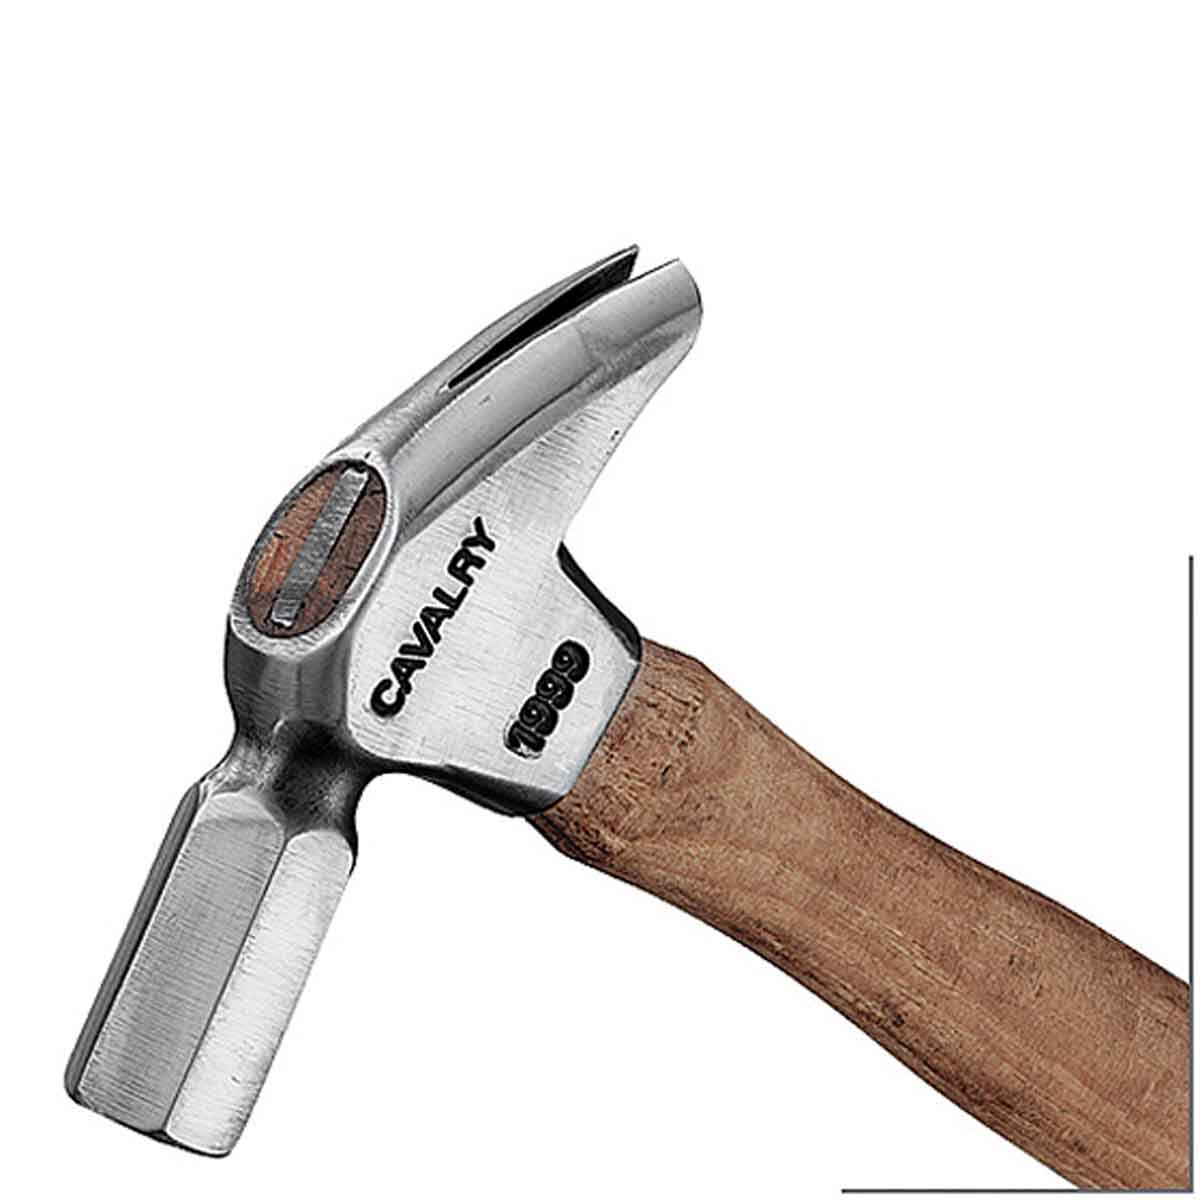 Cavalary Nailing Hammers